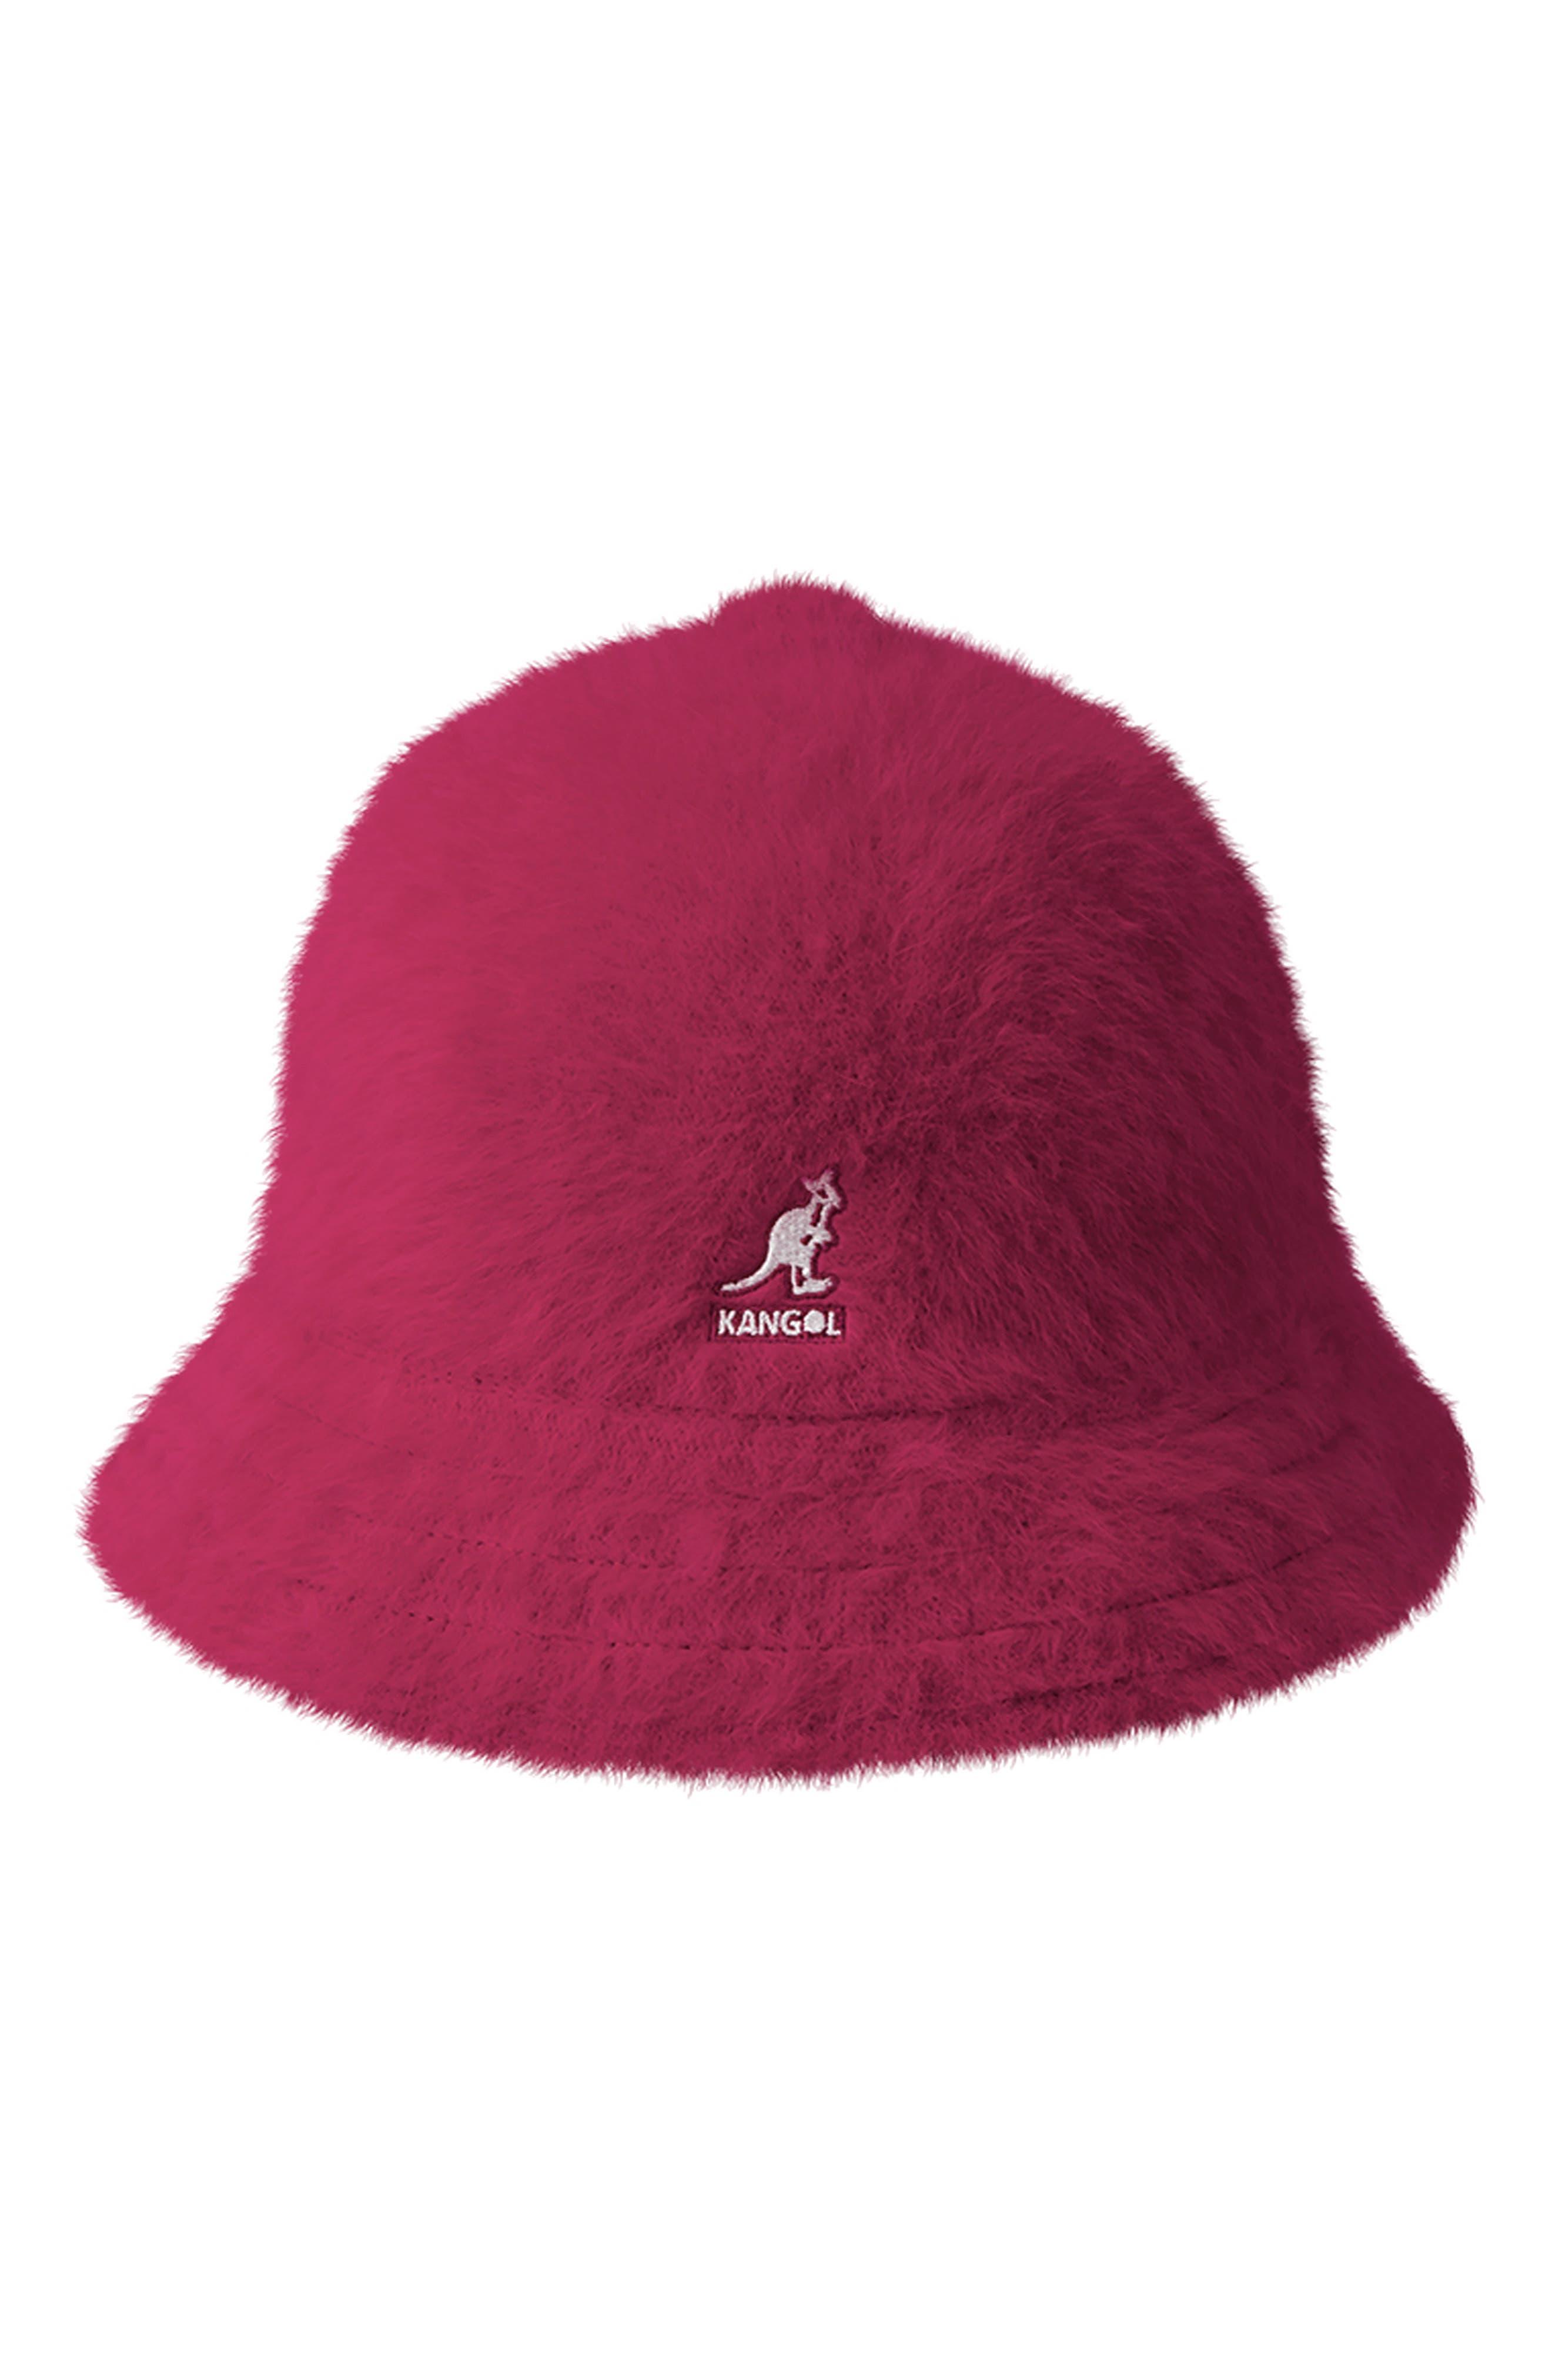 Buy kangol hats for women - Best women s kangol hats shop - Cools.com c52b0f27be14